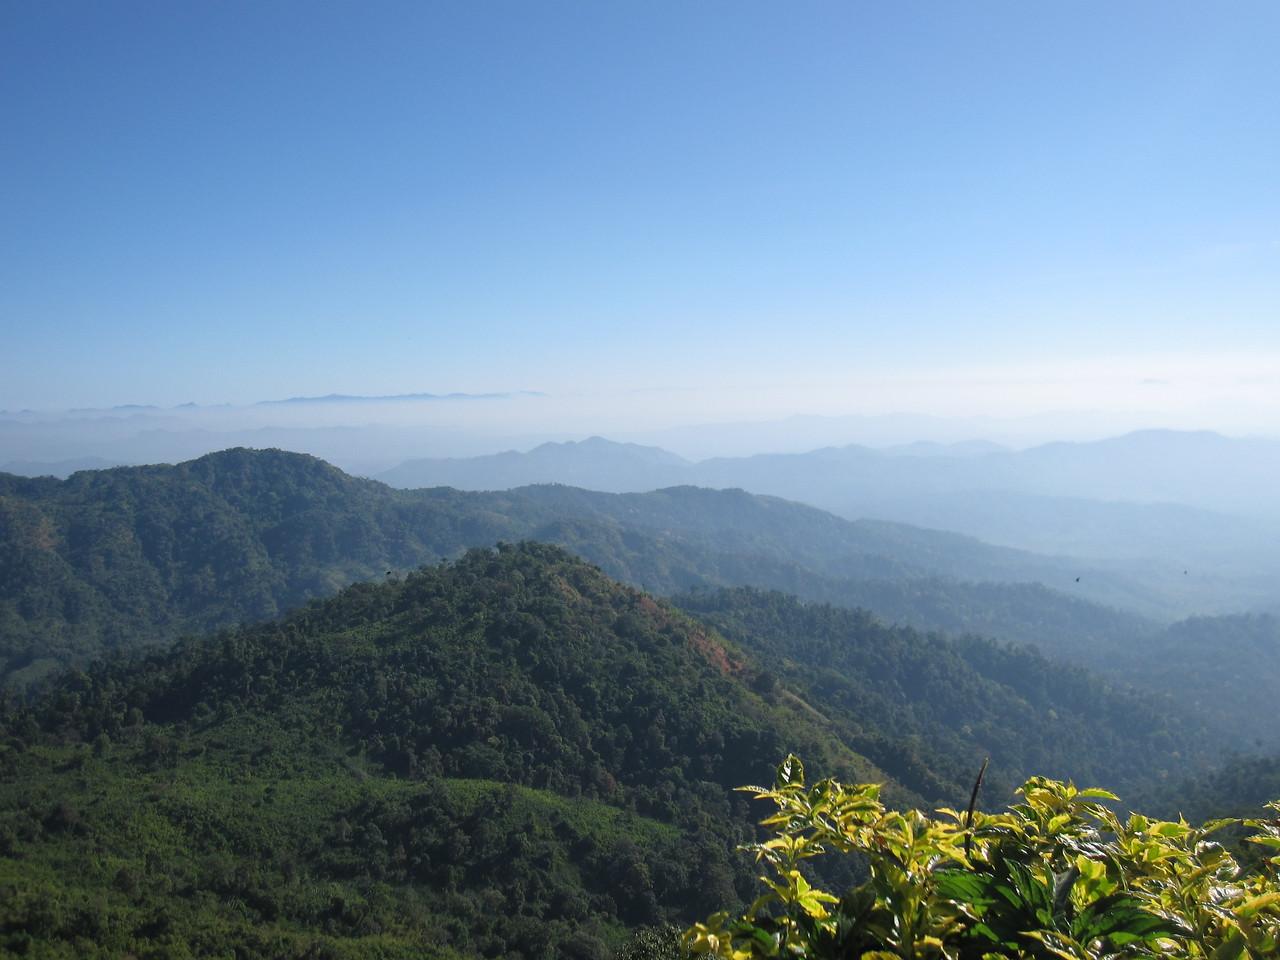 The beautiful landscape around Kyaiktiyo, the Golden Rock, in Burma.